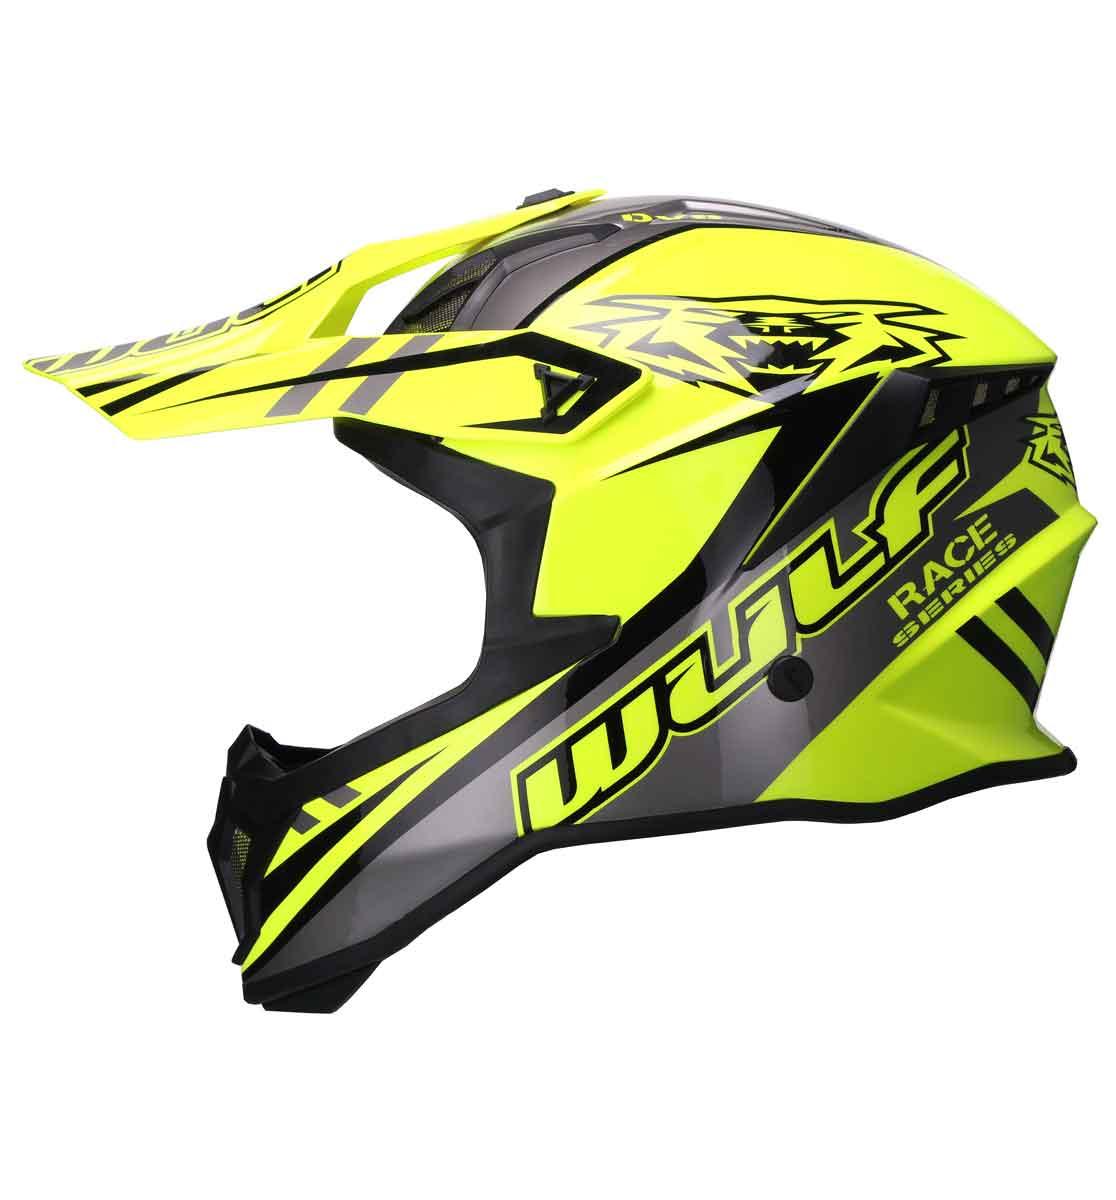 Wulfsport Race Series Helmet - ECE R 2205 - Yellow